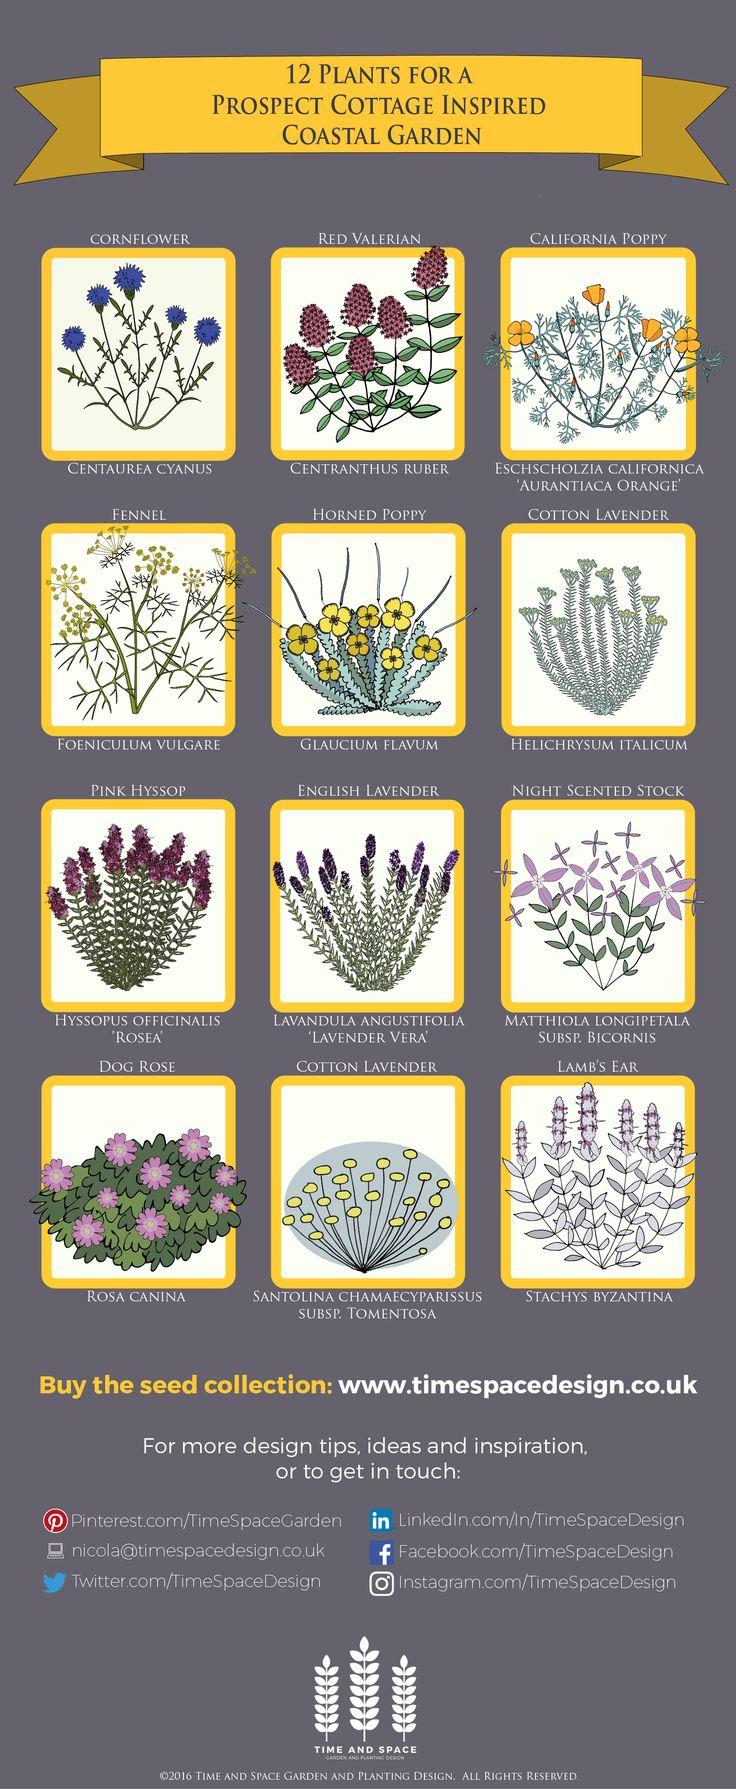 12 Plants for a Prospect Cottage Inspired Coastal Garden